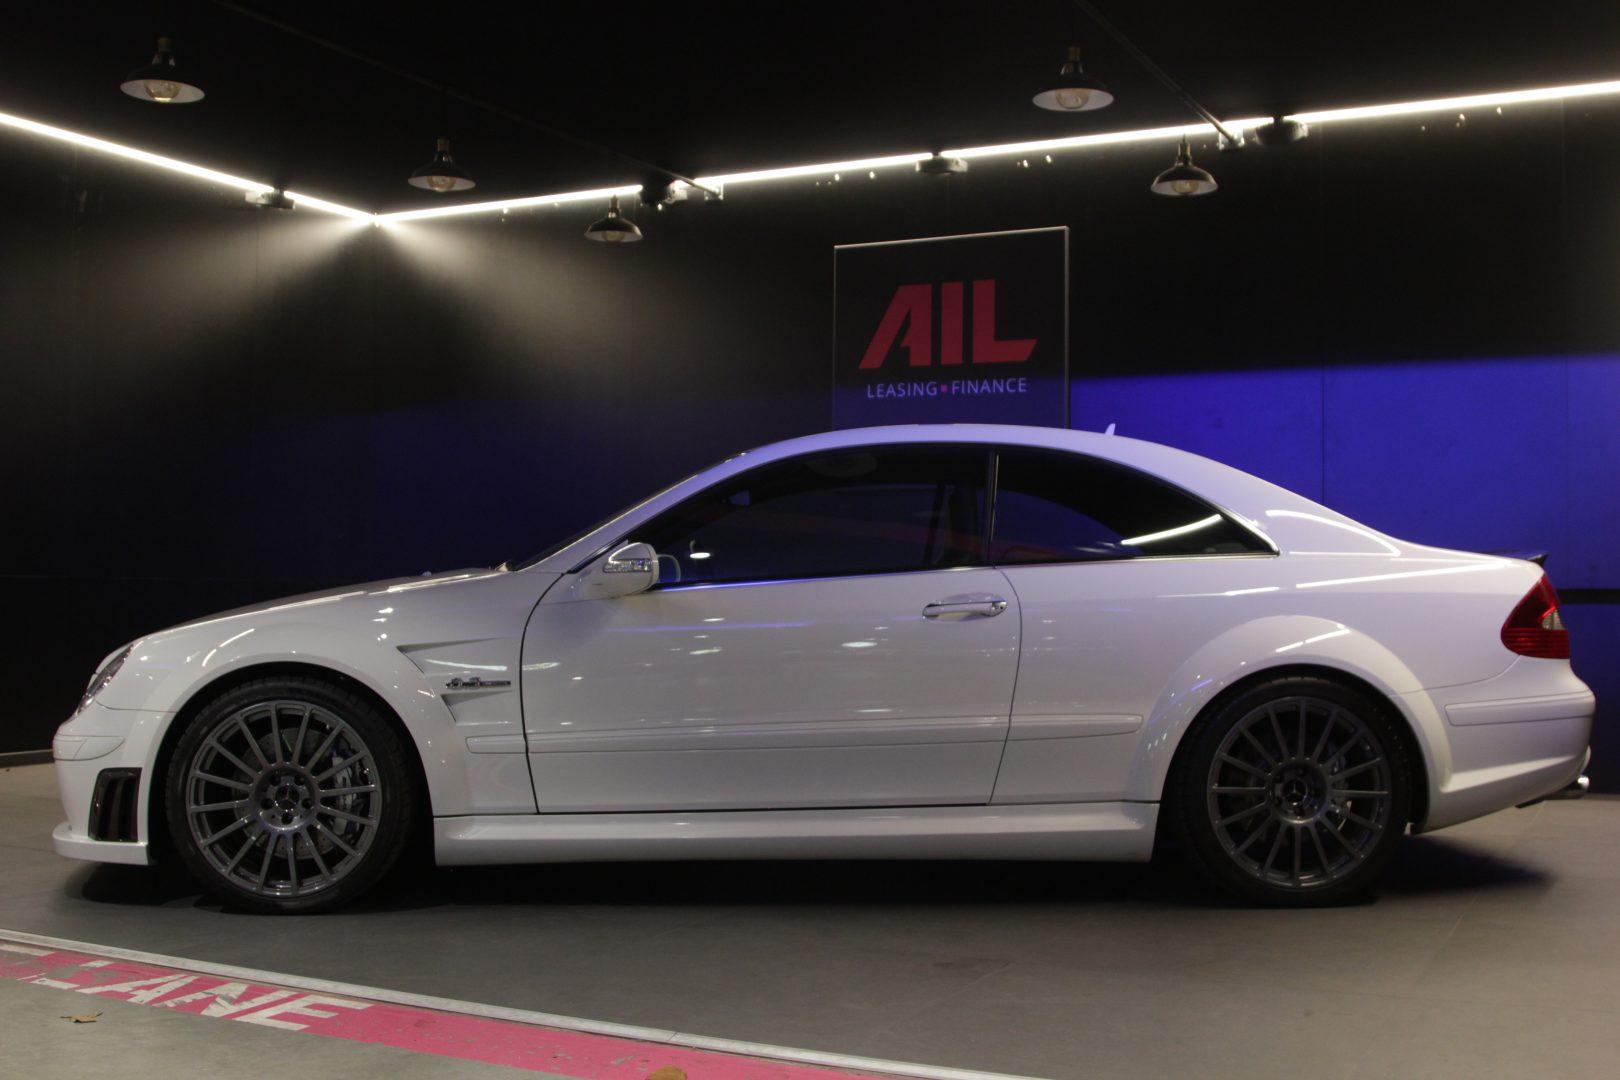 AIL Mercedes-Benz CLK 63 AMG Black Series 4